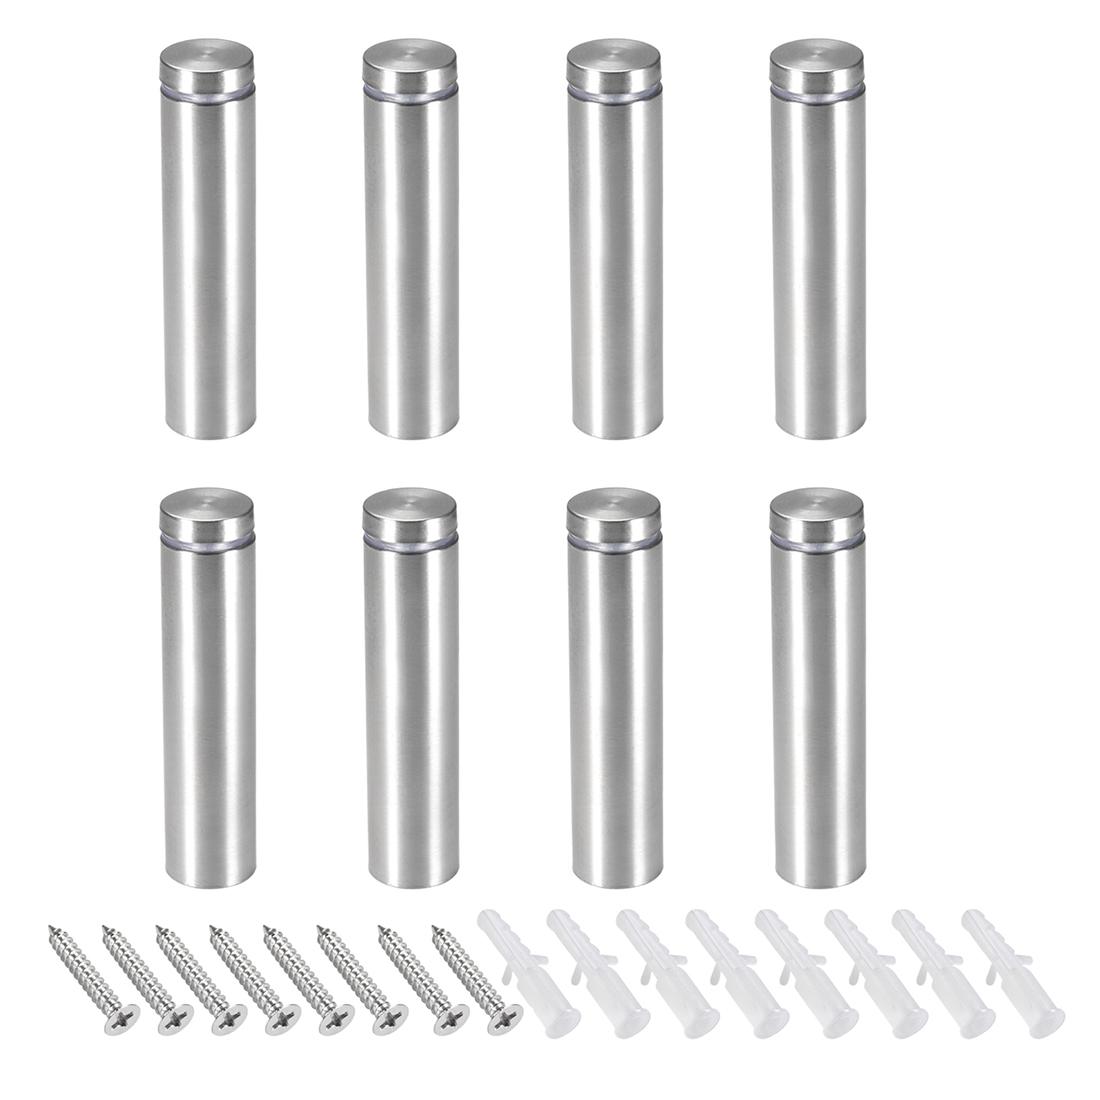 Glass Standoff Mount Stainless Steel Wall Standoff 19mm Dia 82mm Length 8 Pcs